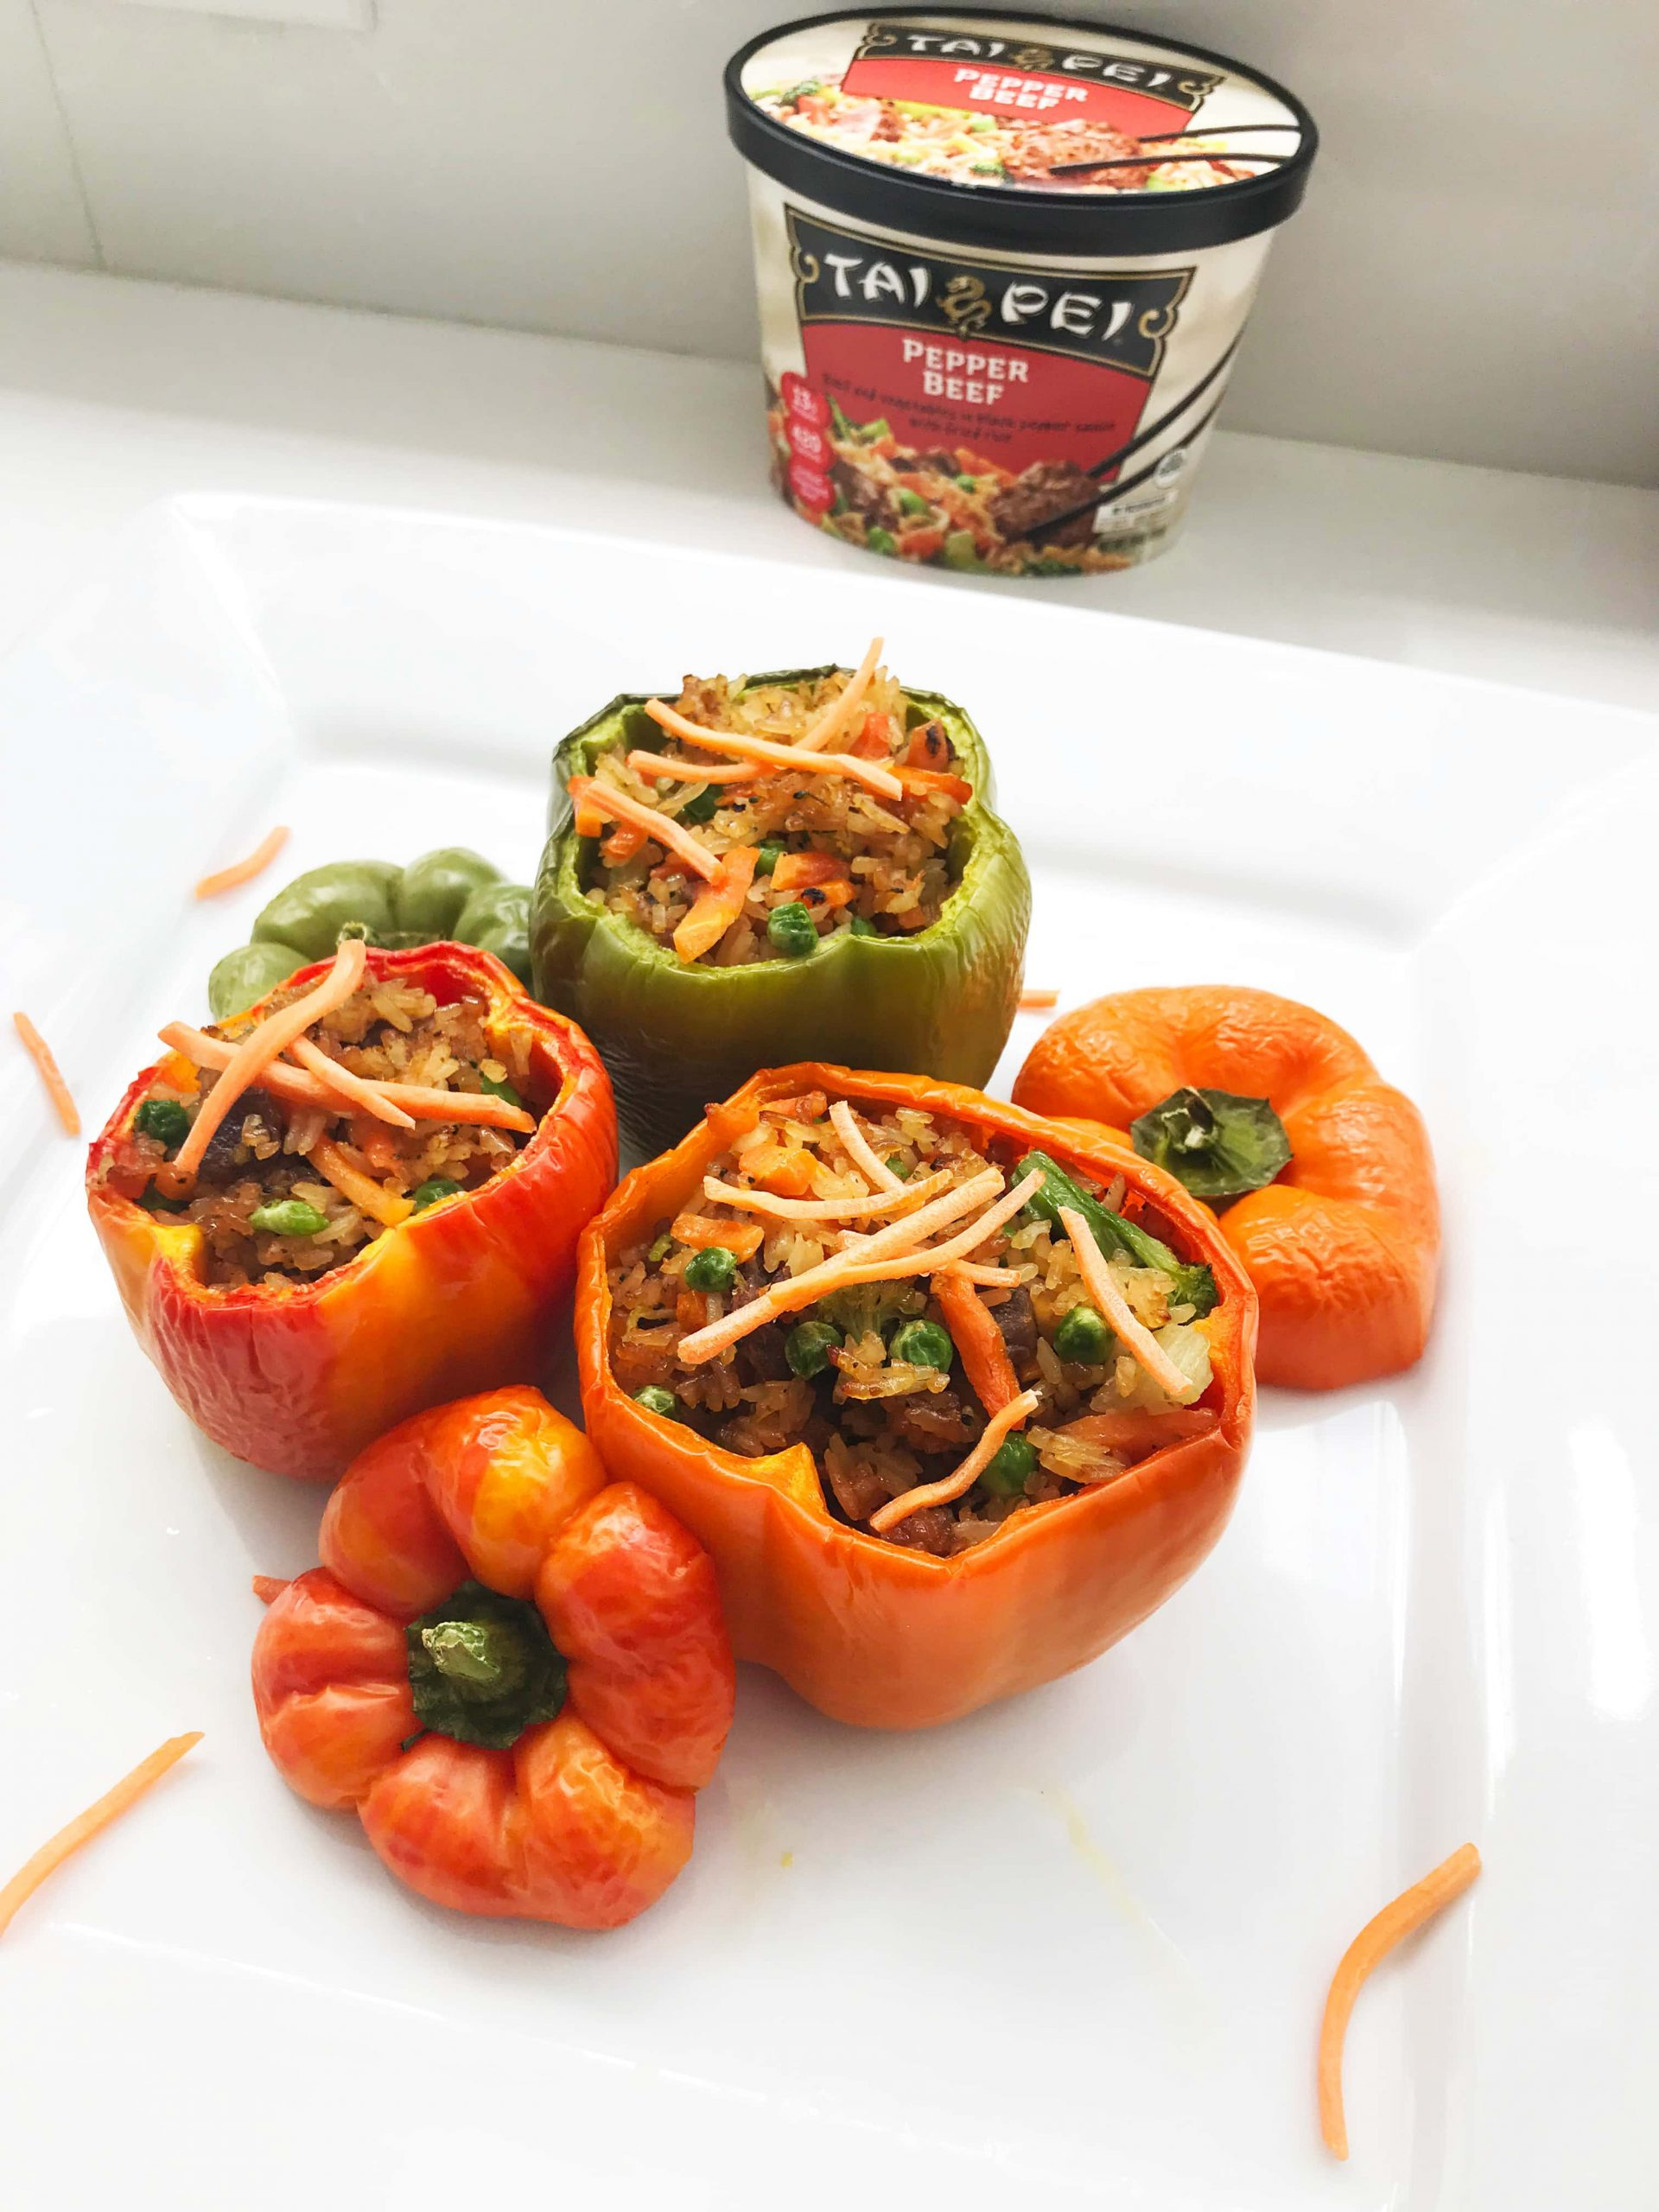 Easy Summer Meal Idea: Pepper Steak Stuffed Bell Peppers